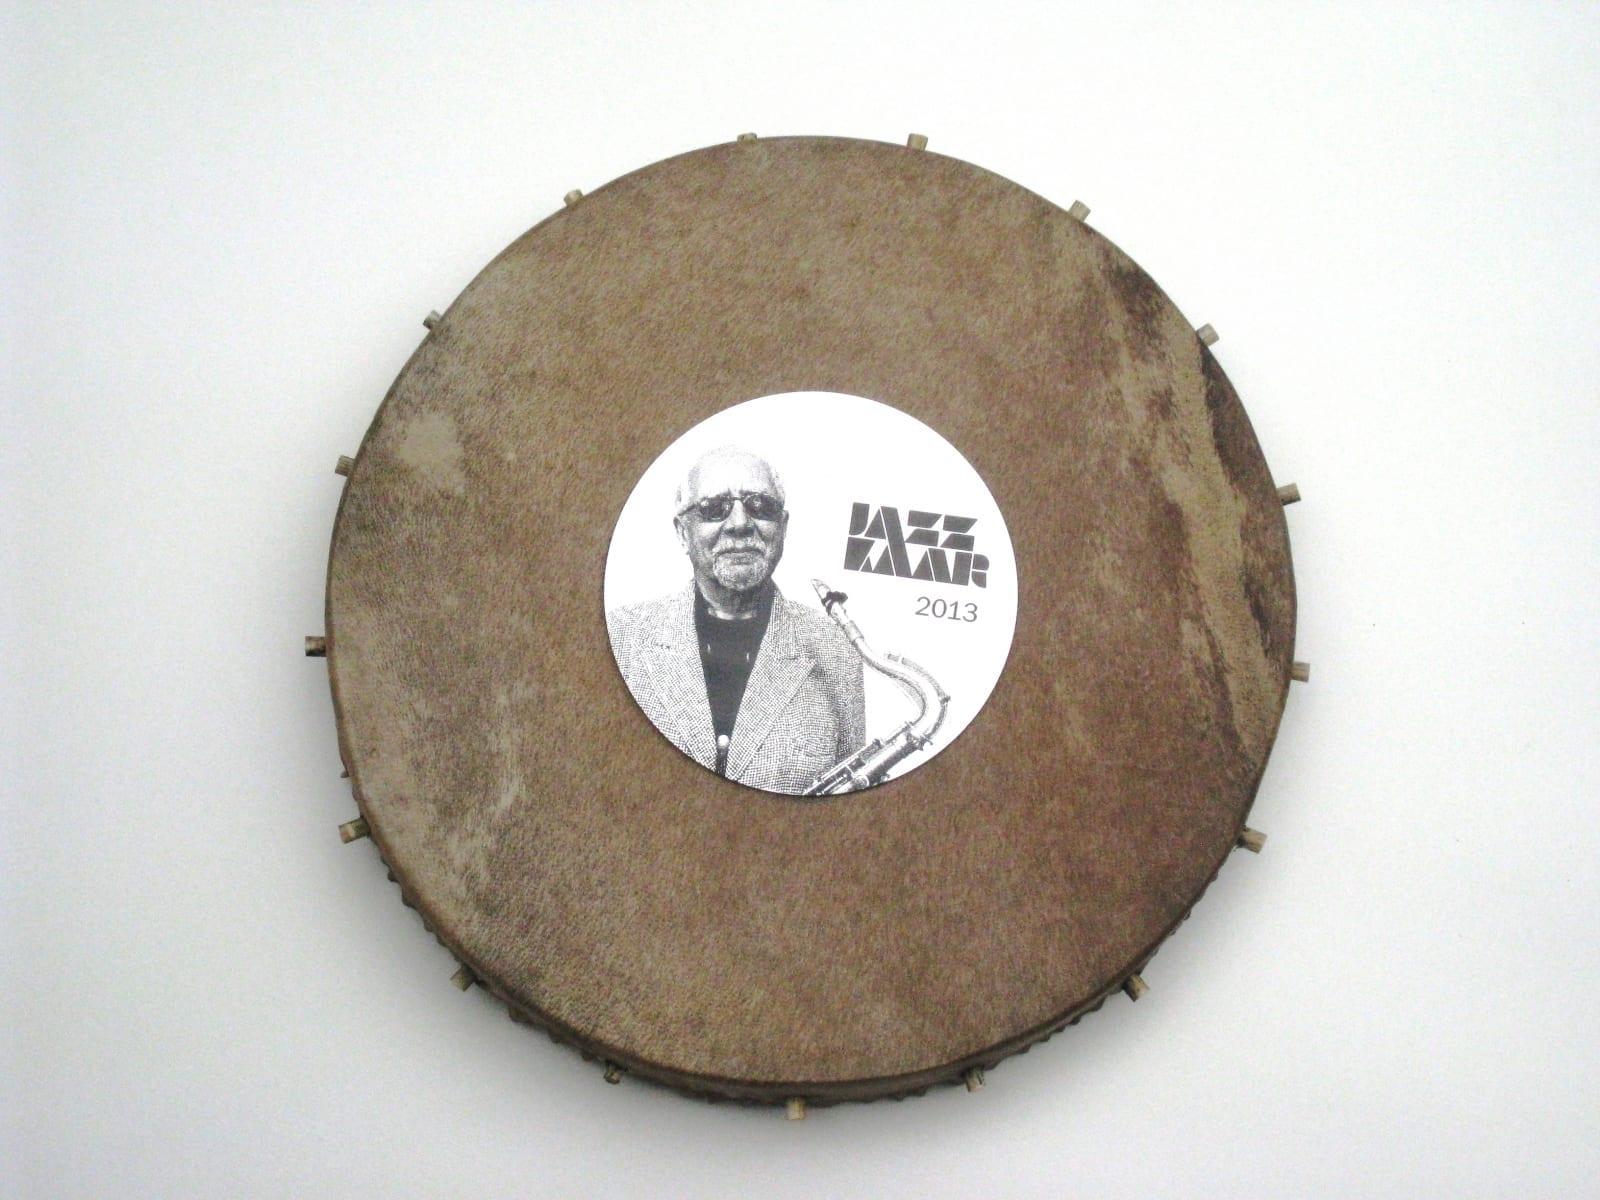 Kingitus muusik CHARLES LLOYDILE 2013 trumm, lasergraveering roostevabal terasel<br/> A gift to a jazzmusician CHARLES LLOYD 2013 drum, lazerengraving on stainless steel